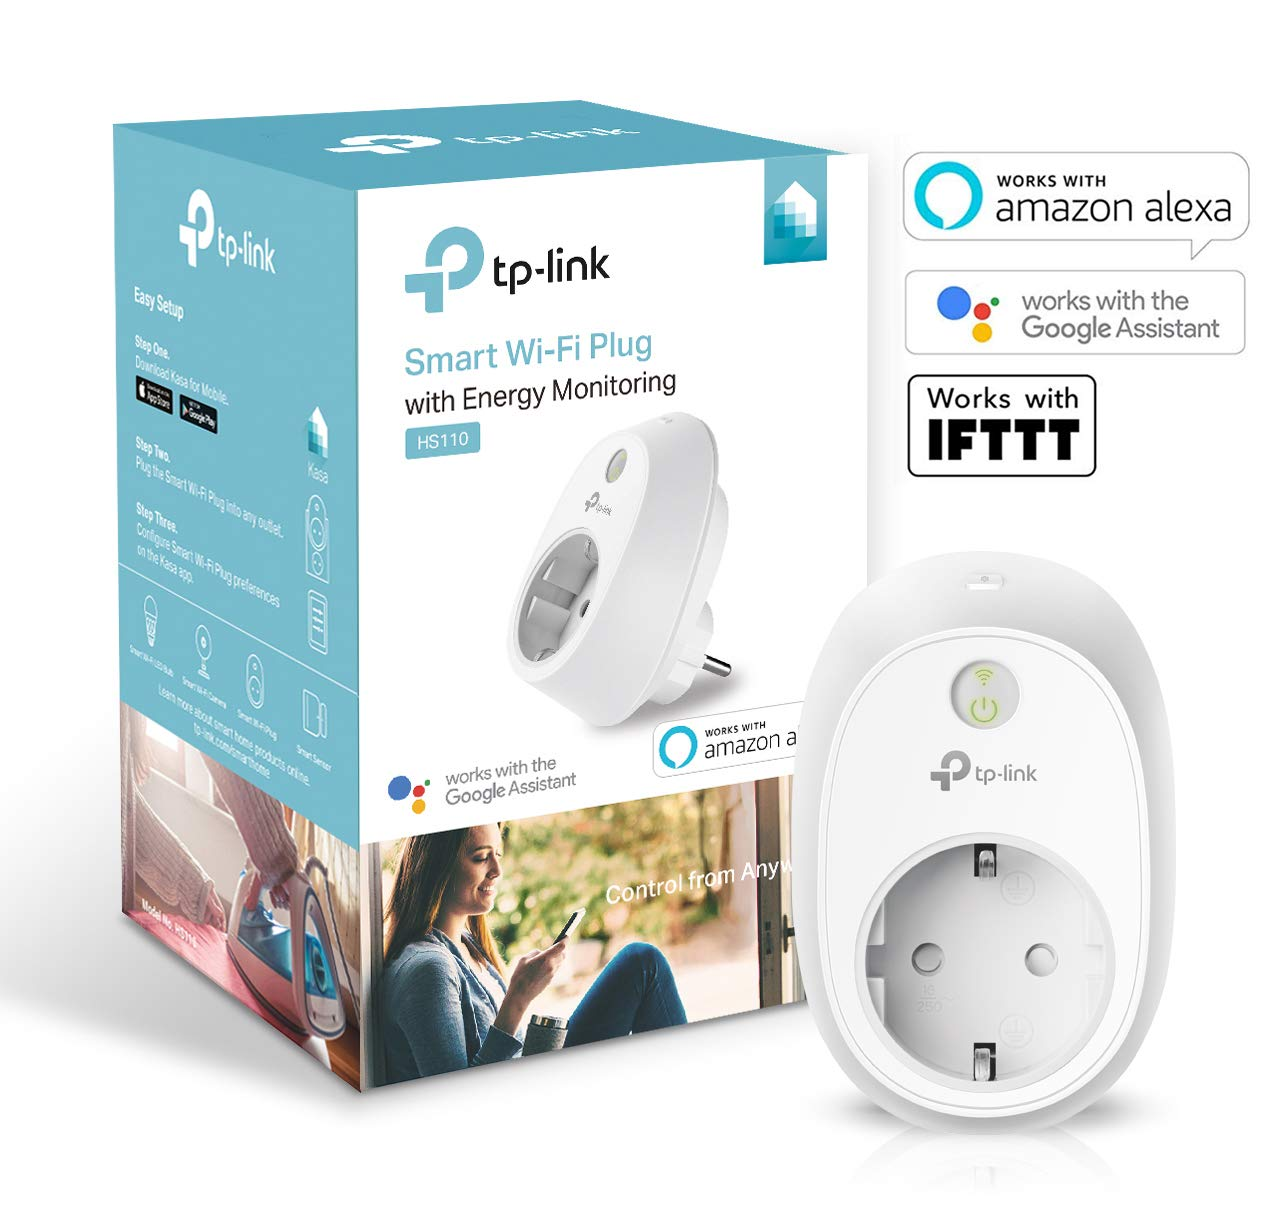 TP-LINK HS110 - Enchufe Inteligente inalámbrico con monitorización de energía, controle sus dispositivos